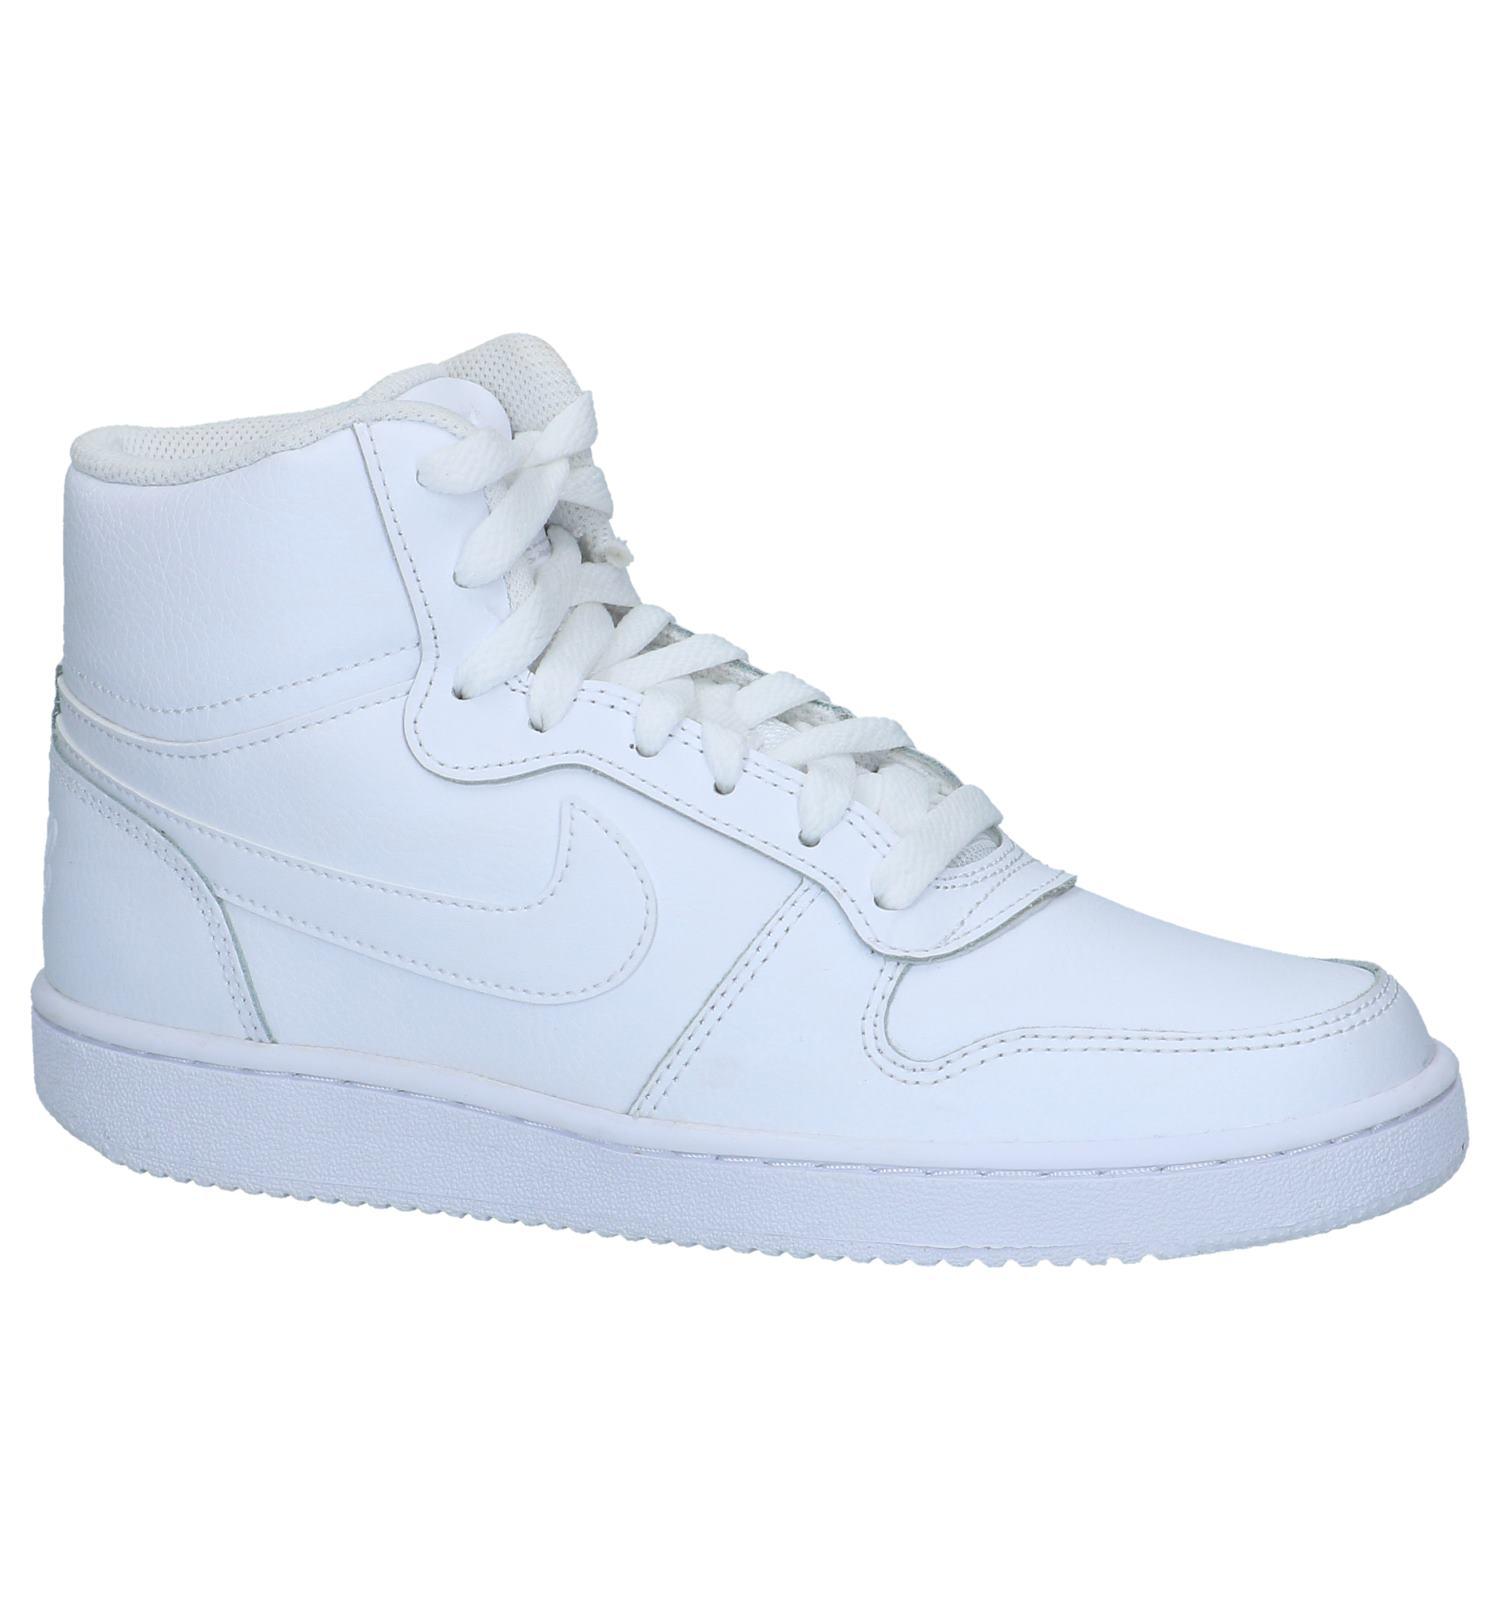 49a650090cd Nike Ebernon Mid Witte Hoge Sneakers   TORFS.BE   Gratis verzend en retour